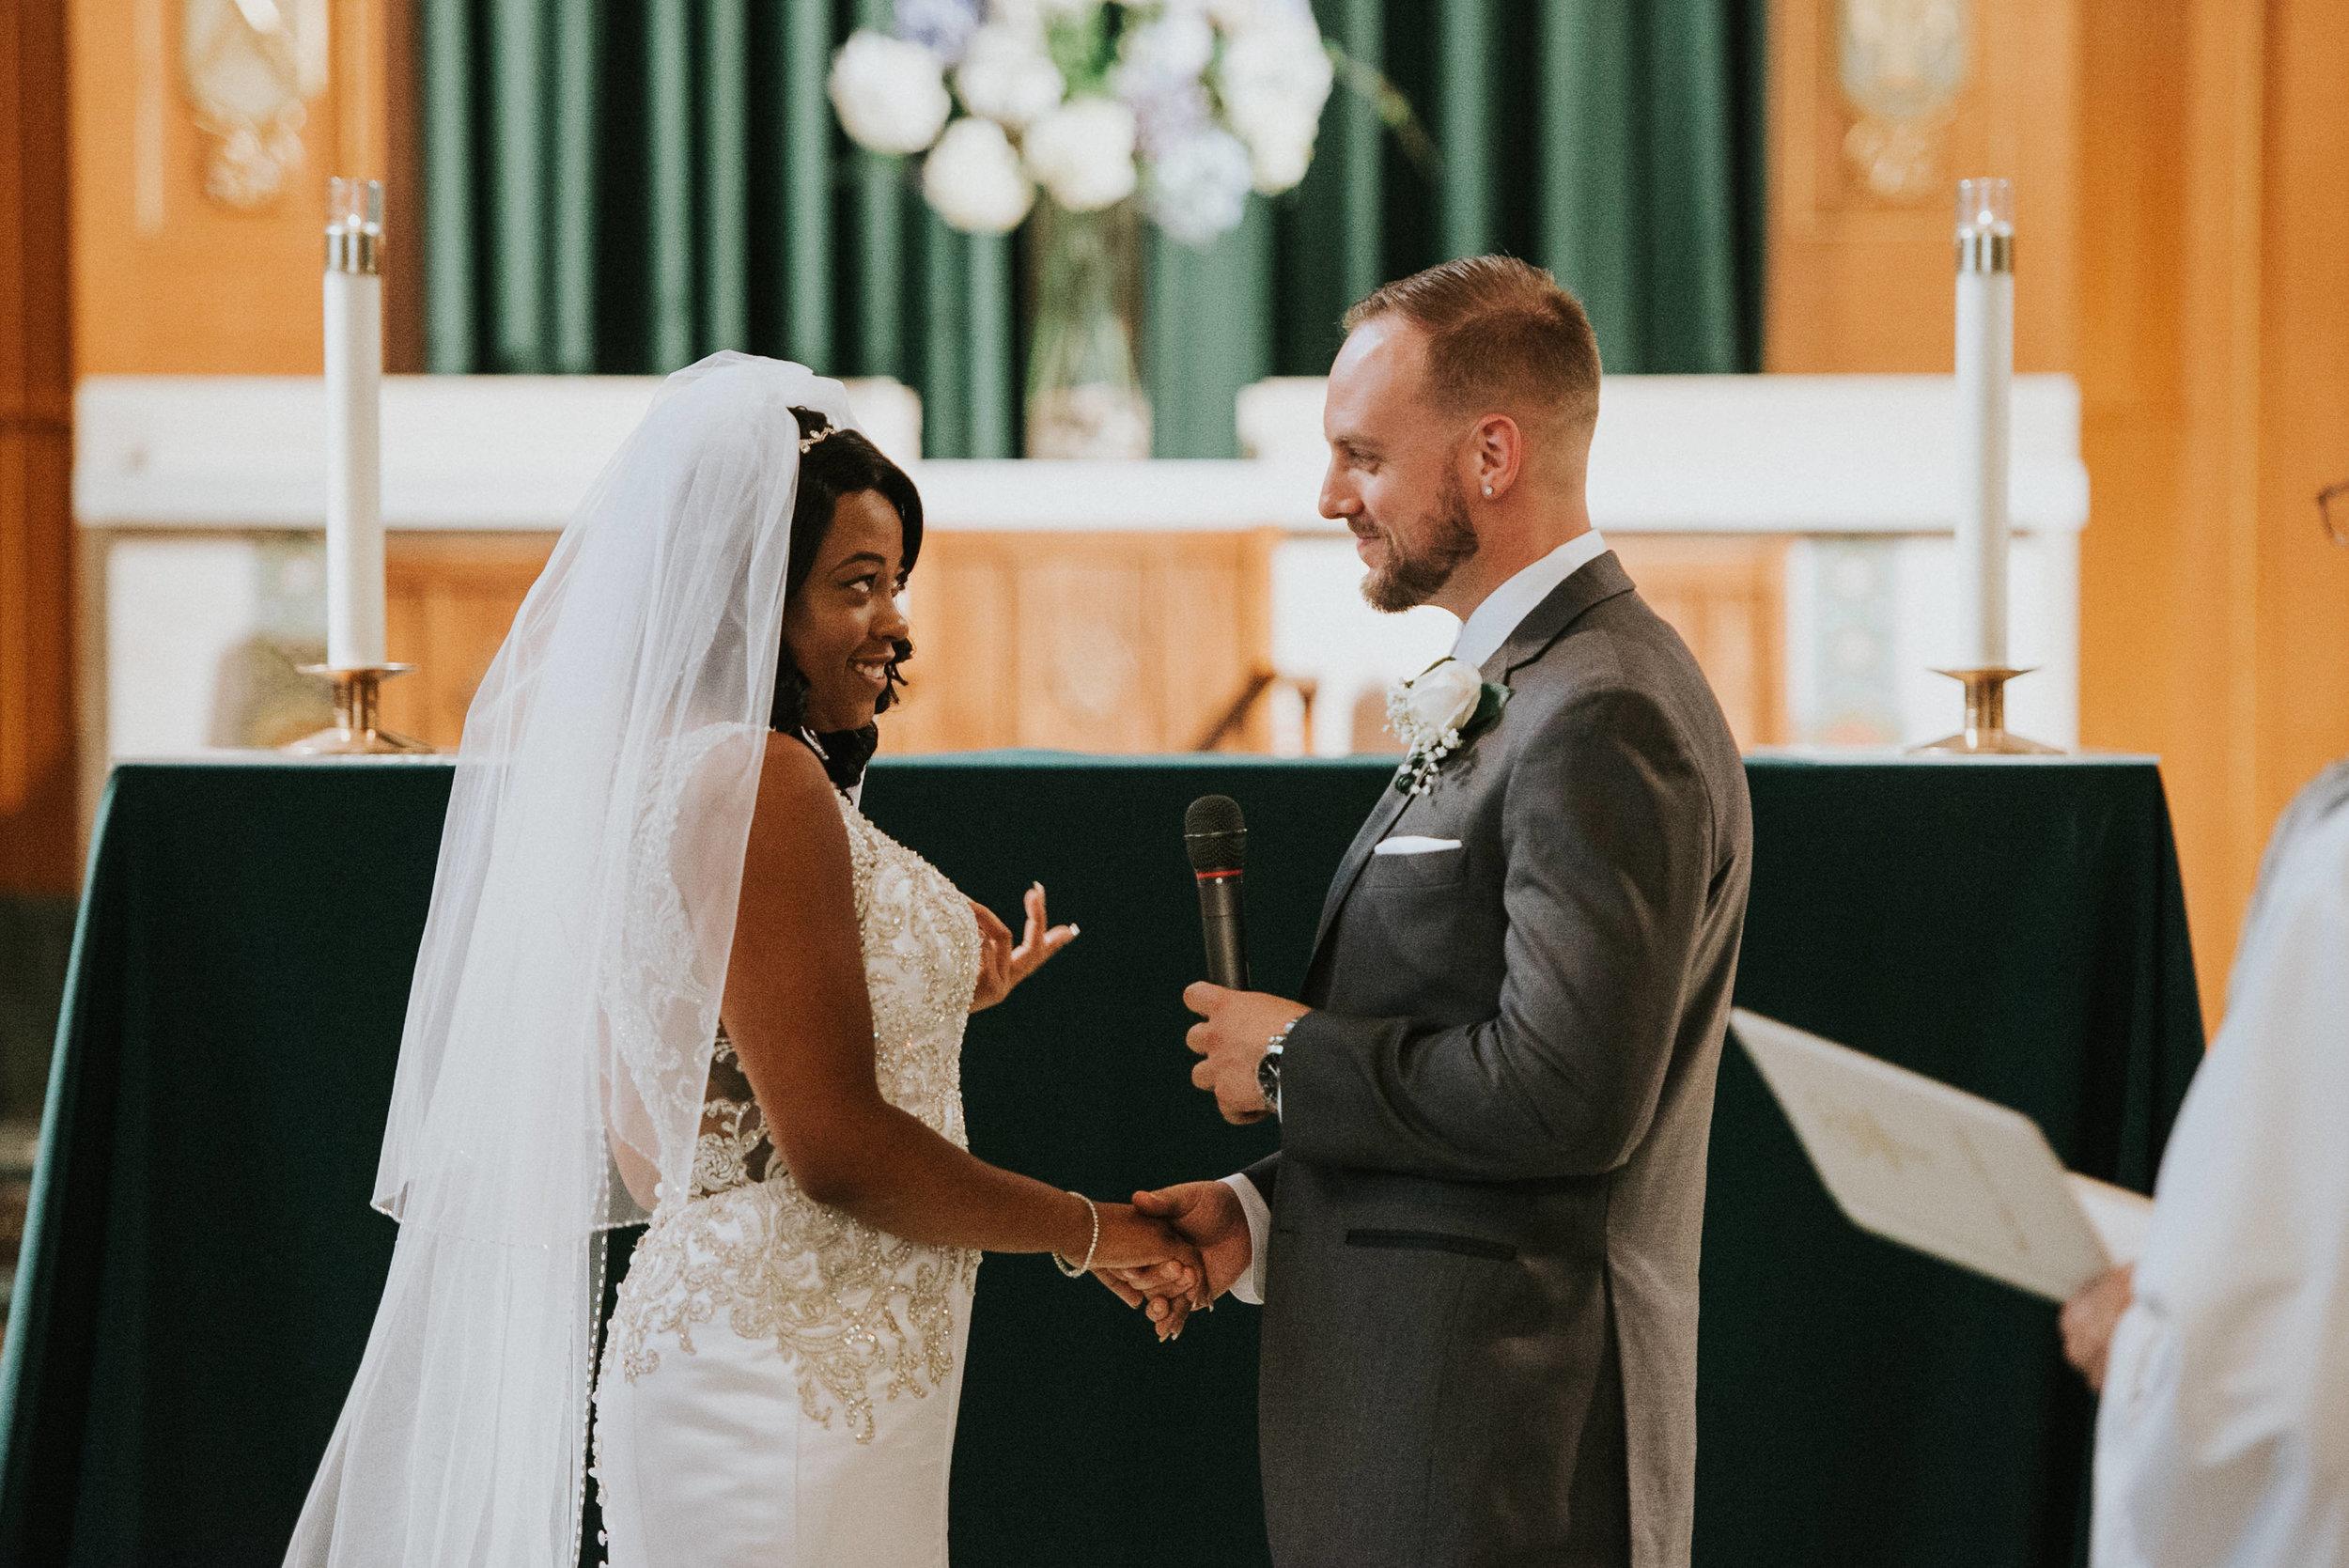 Tiana-and-Danny-Wedding-430.jpg